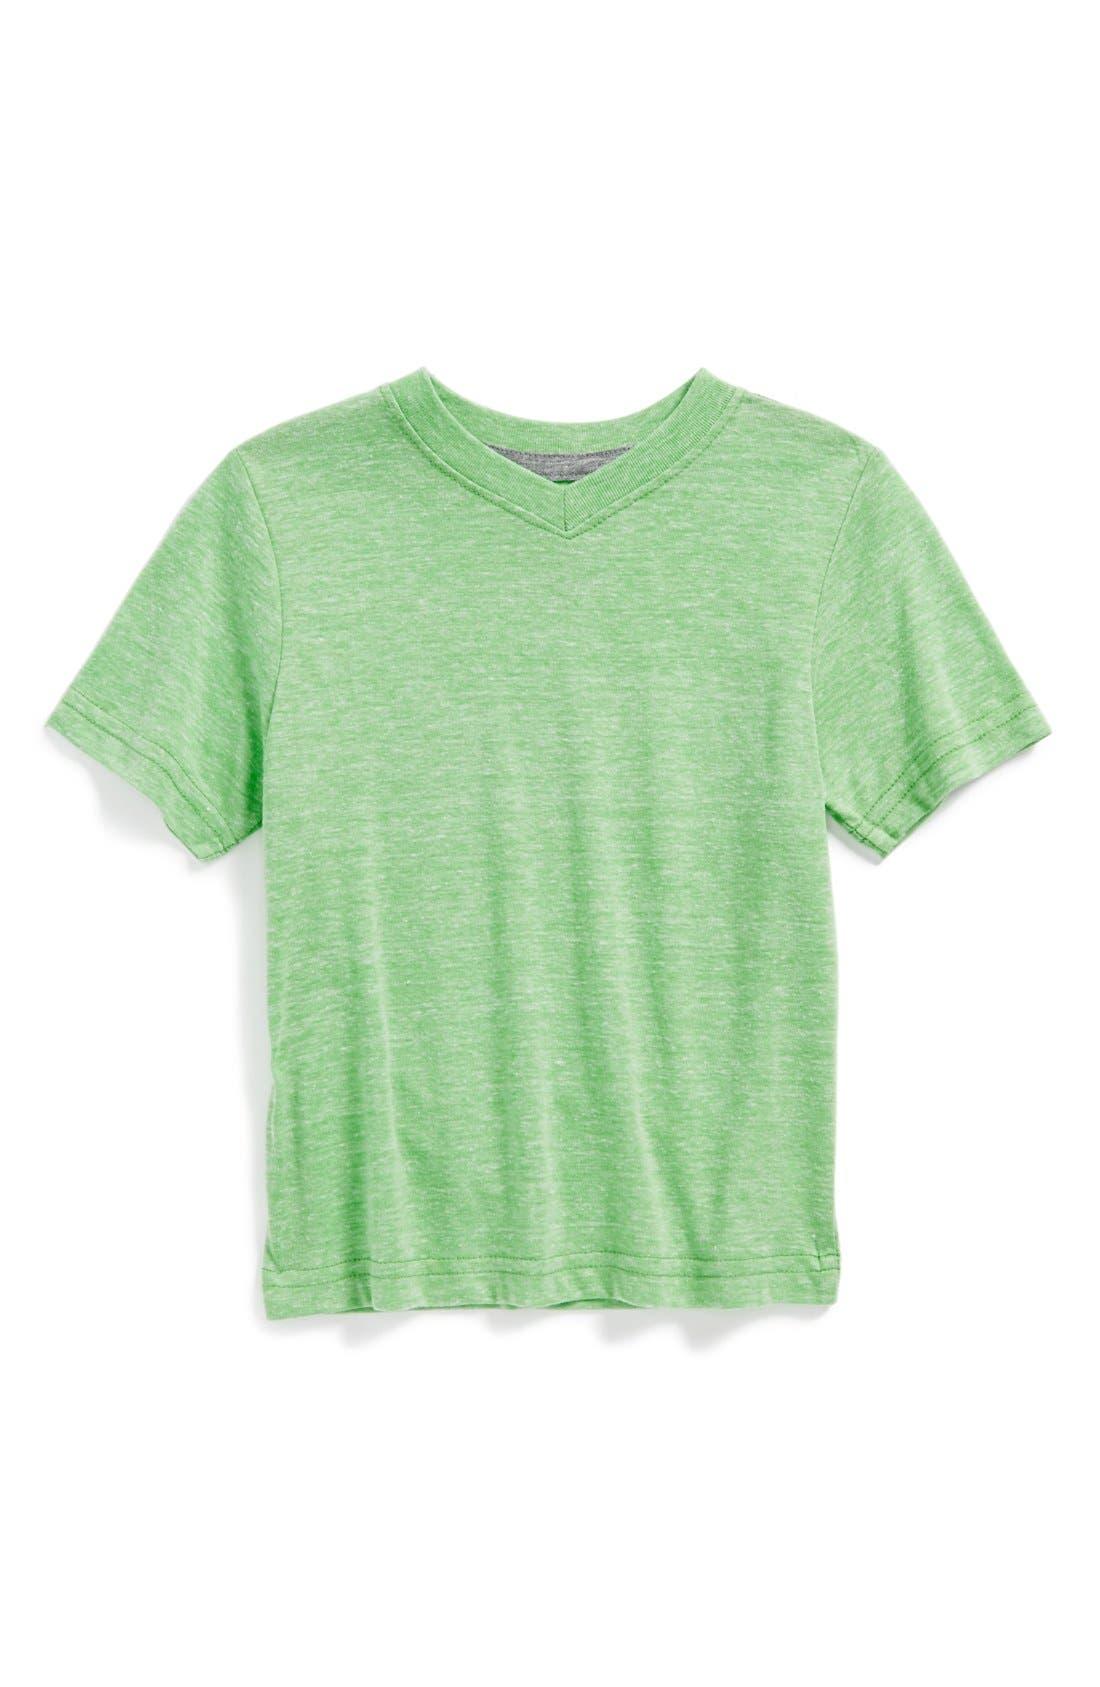 Alternate Image 1 Selected - Tucker + Tate 'Vance' V-Neck T-Shirt (Big Boys)